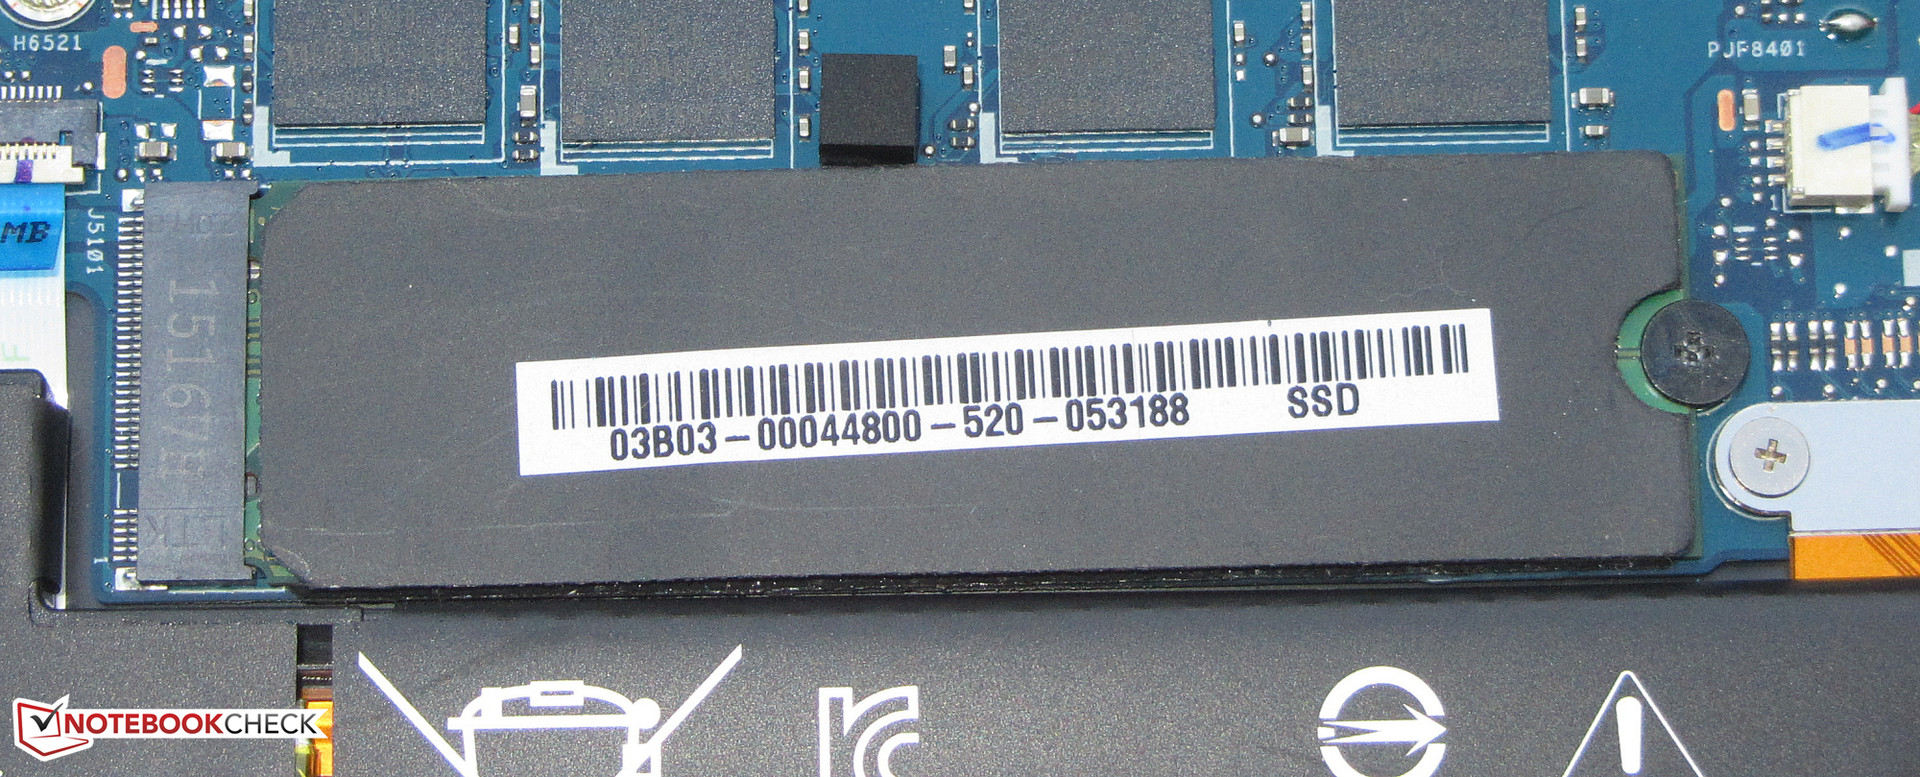 Asus Zenbook UX305LA (Core i7) Subnotebook Review - NotebookCheck